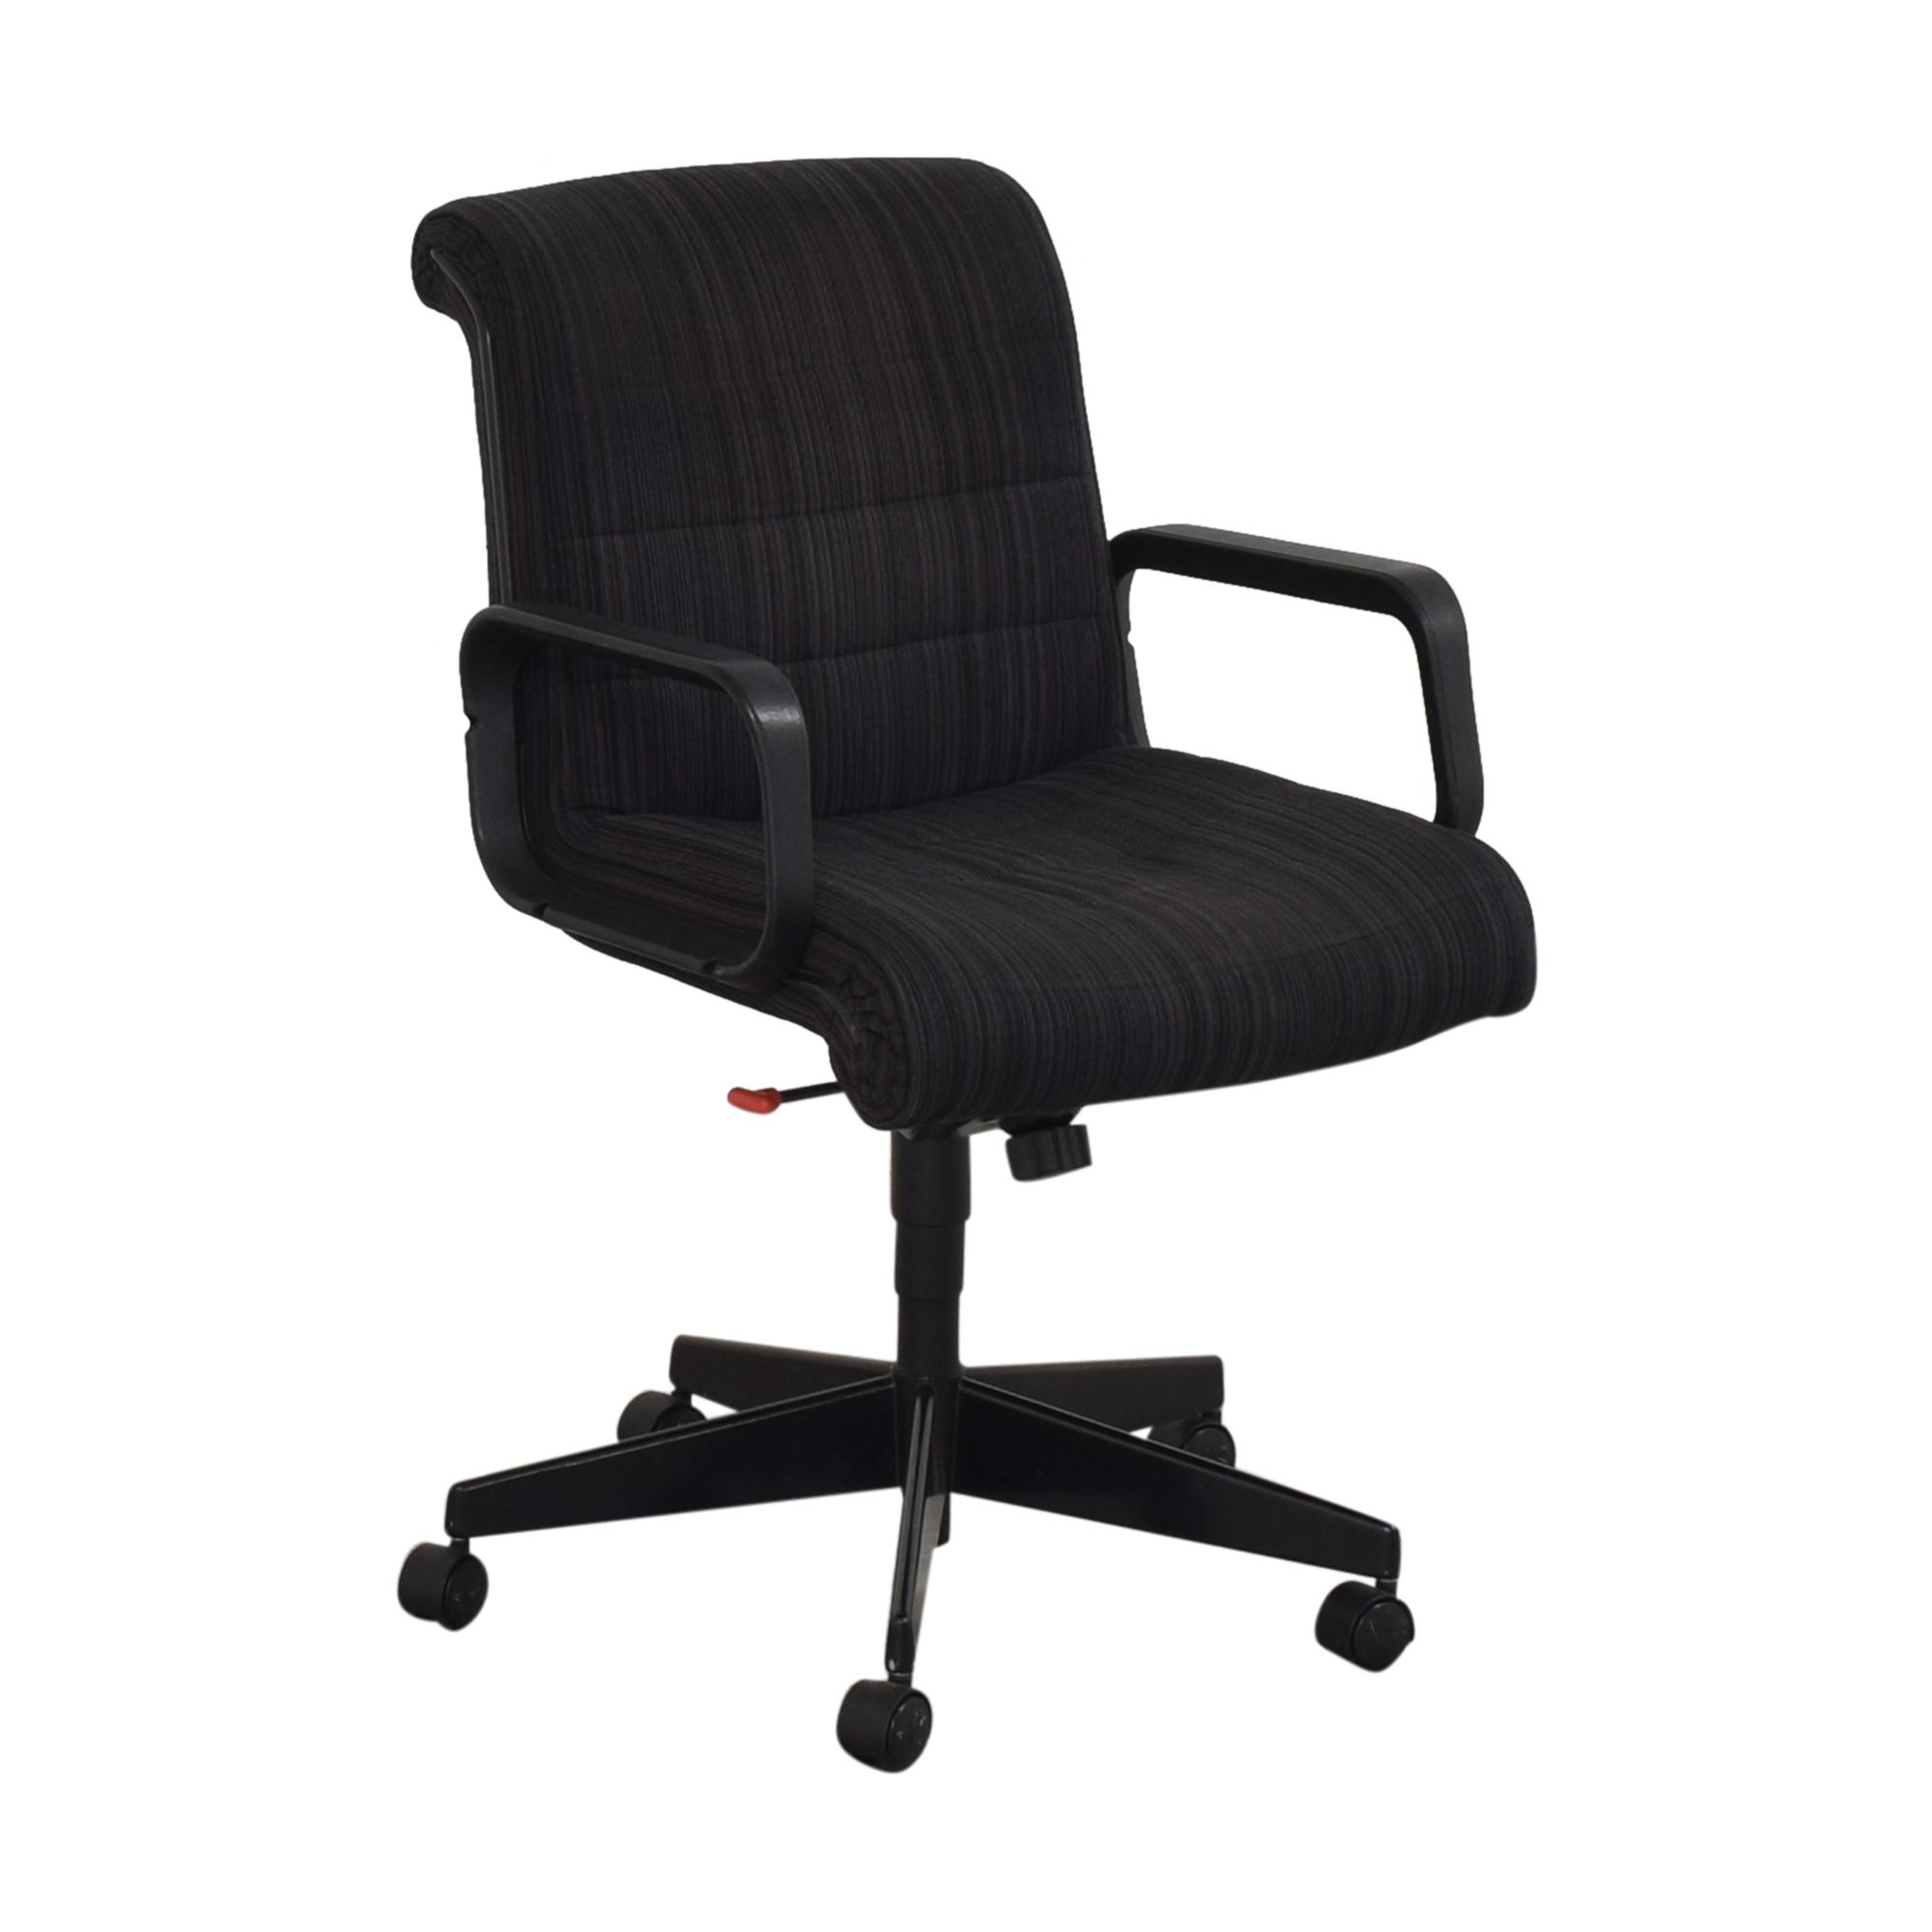 Knoll Knoll Richard Sapper Desk Chair for sale